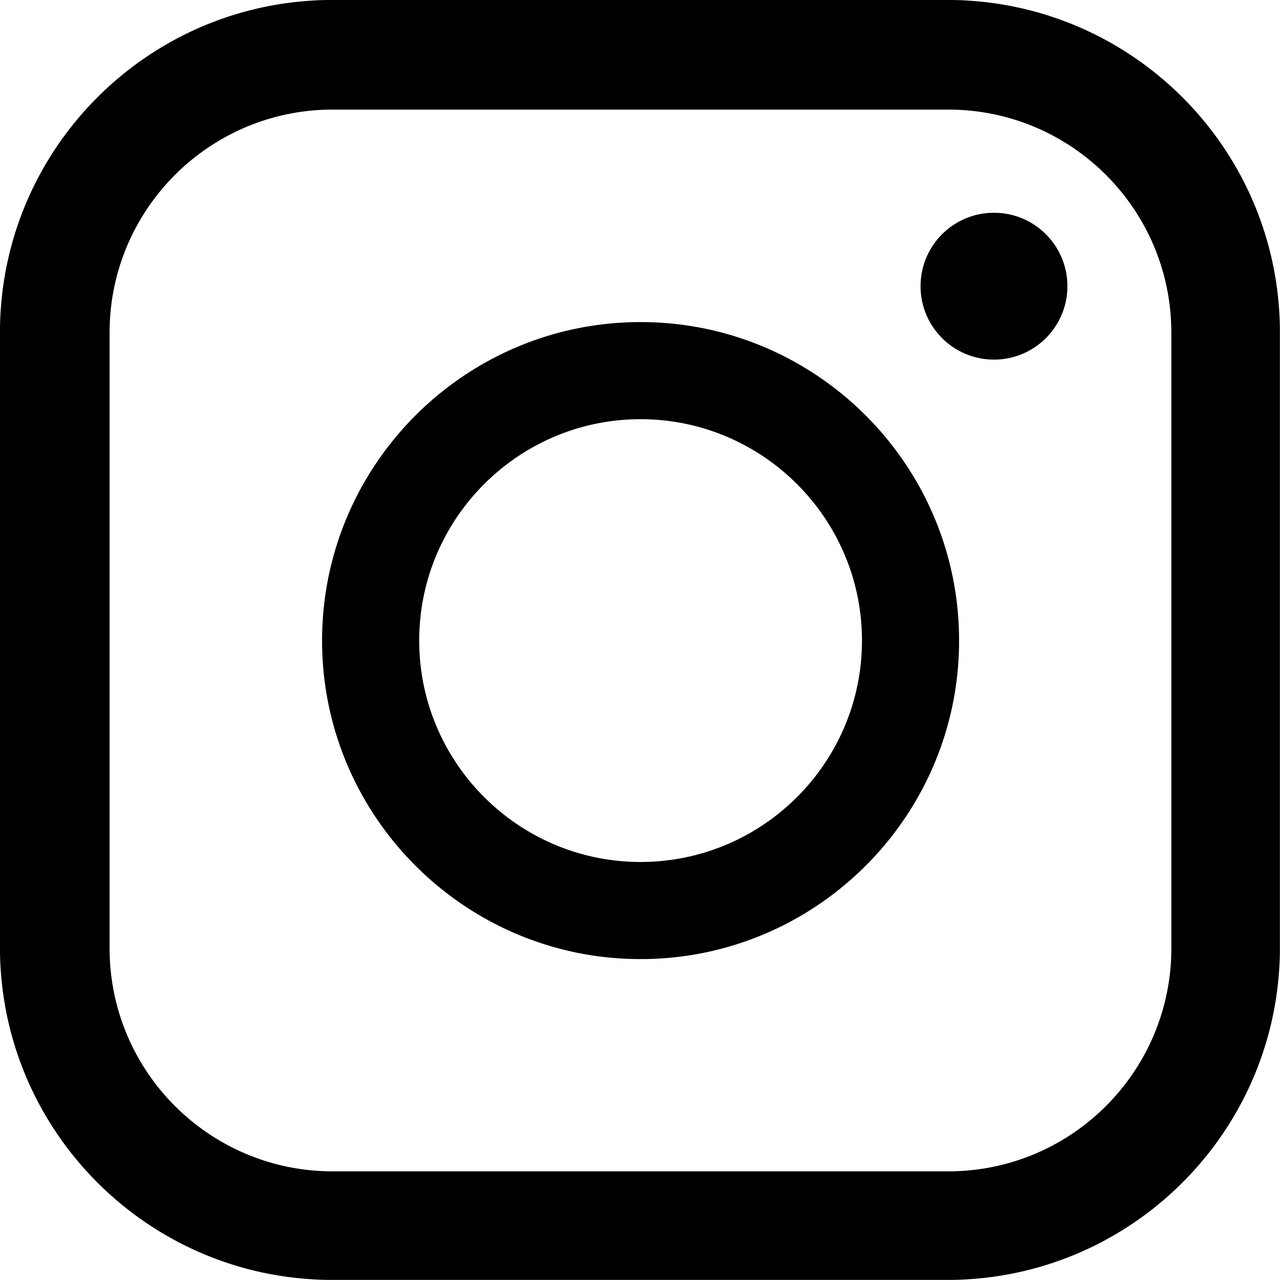 icon-1562139_1280